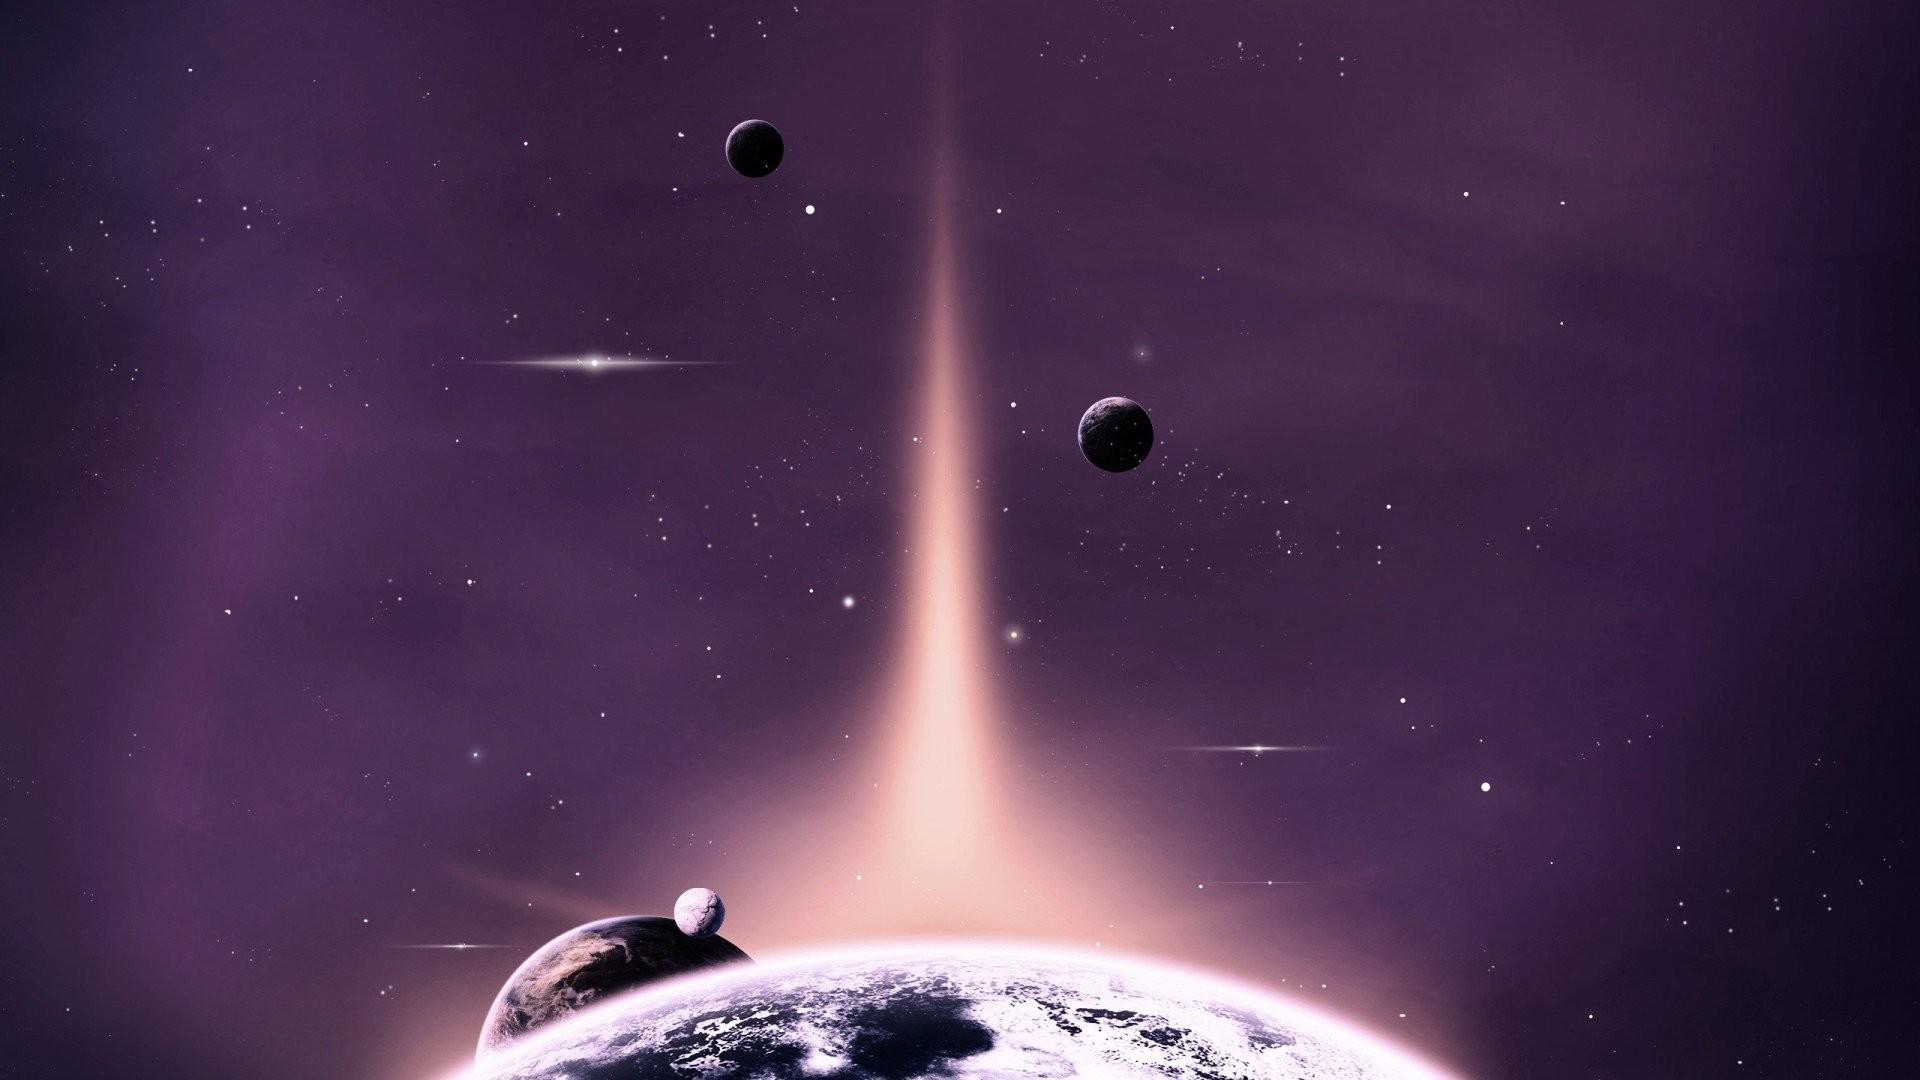 Falling Star Wallpaper Hd Comet Wallpapers 183 ①